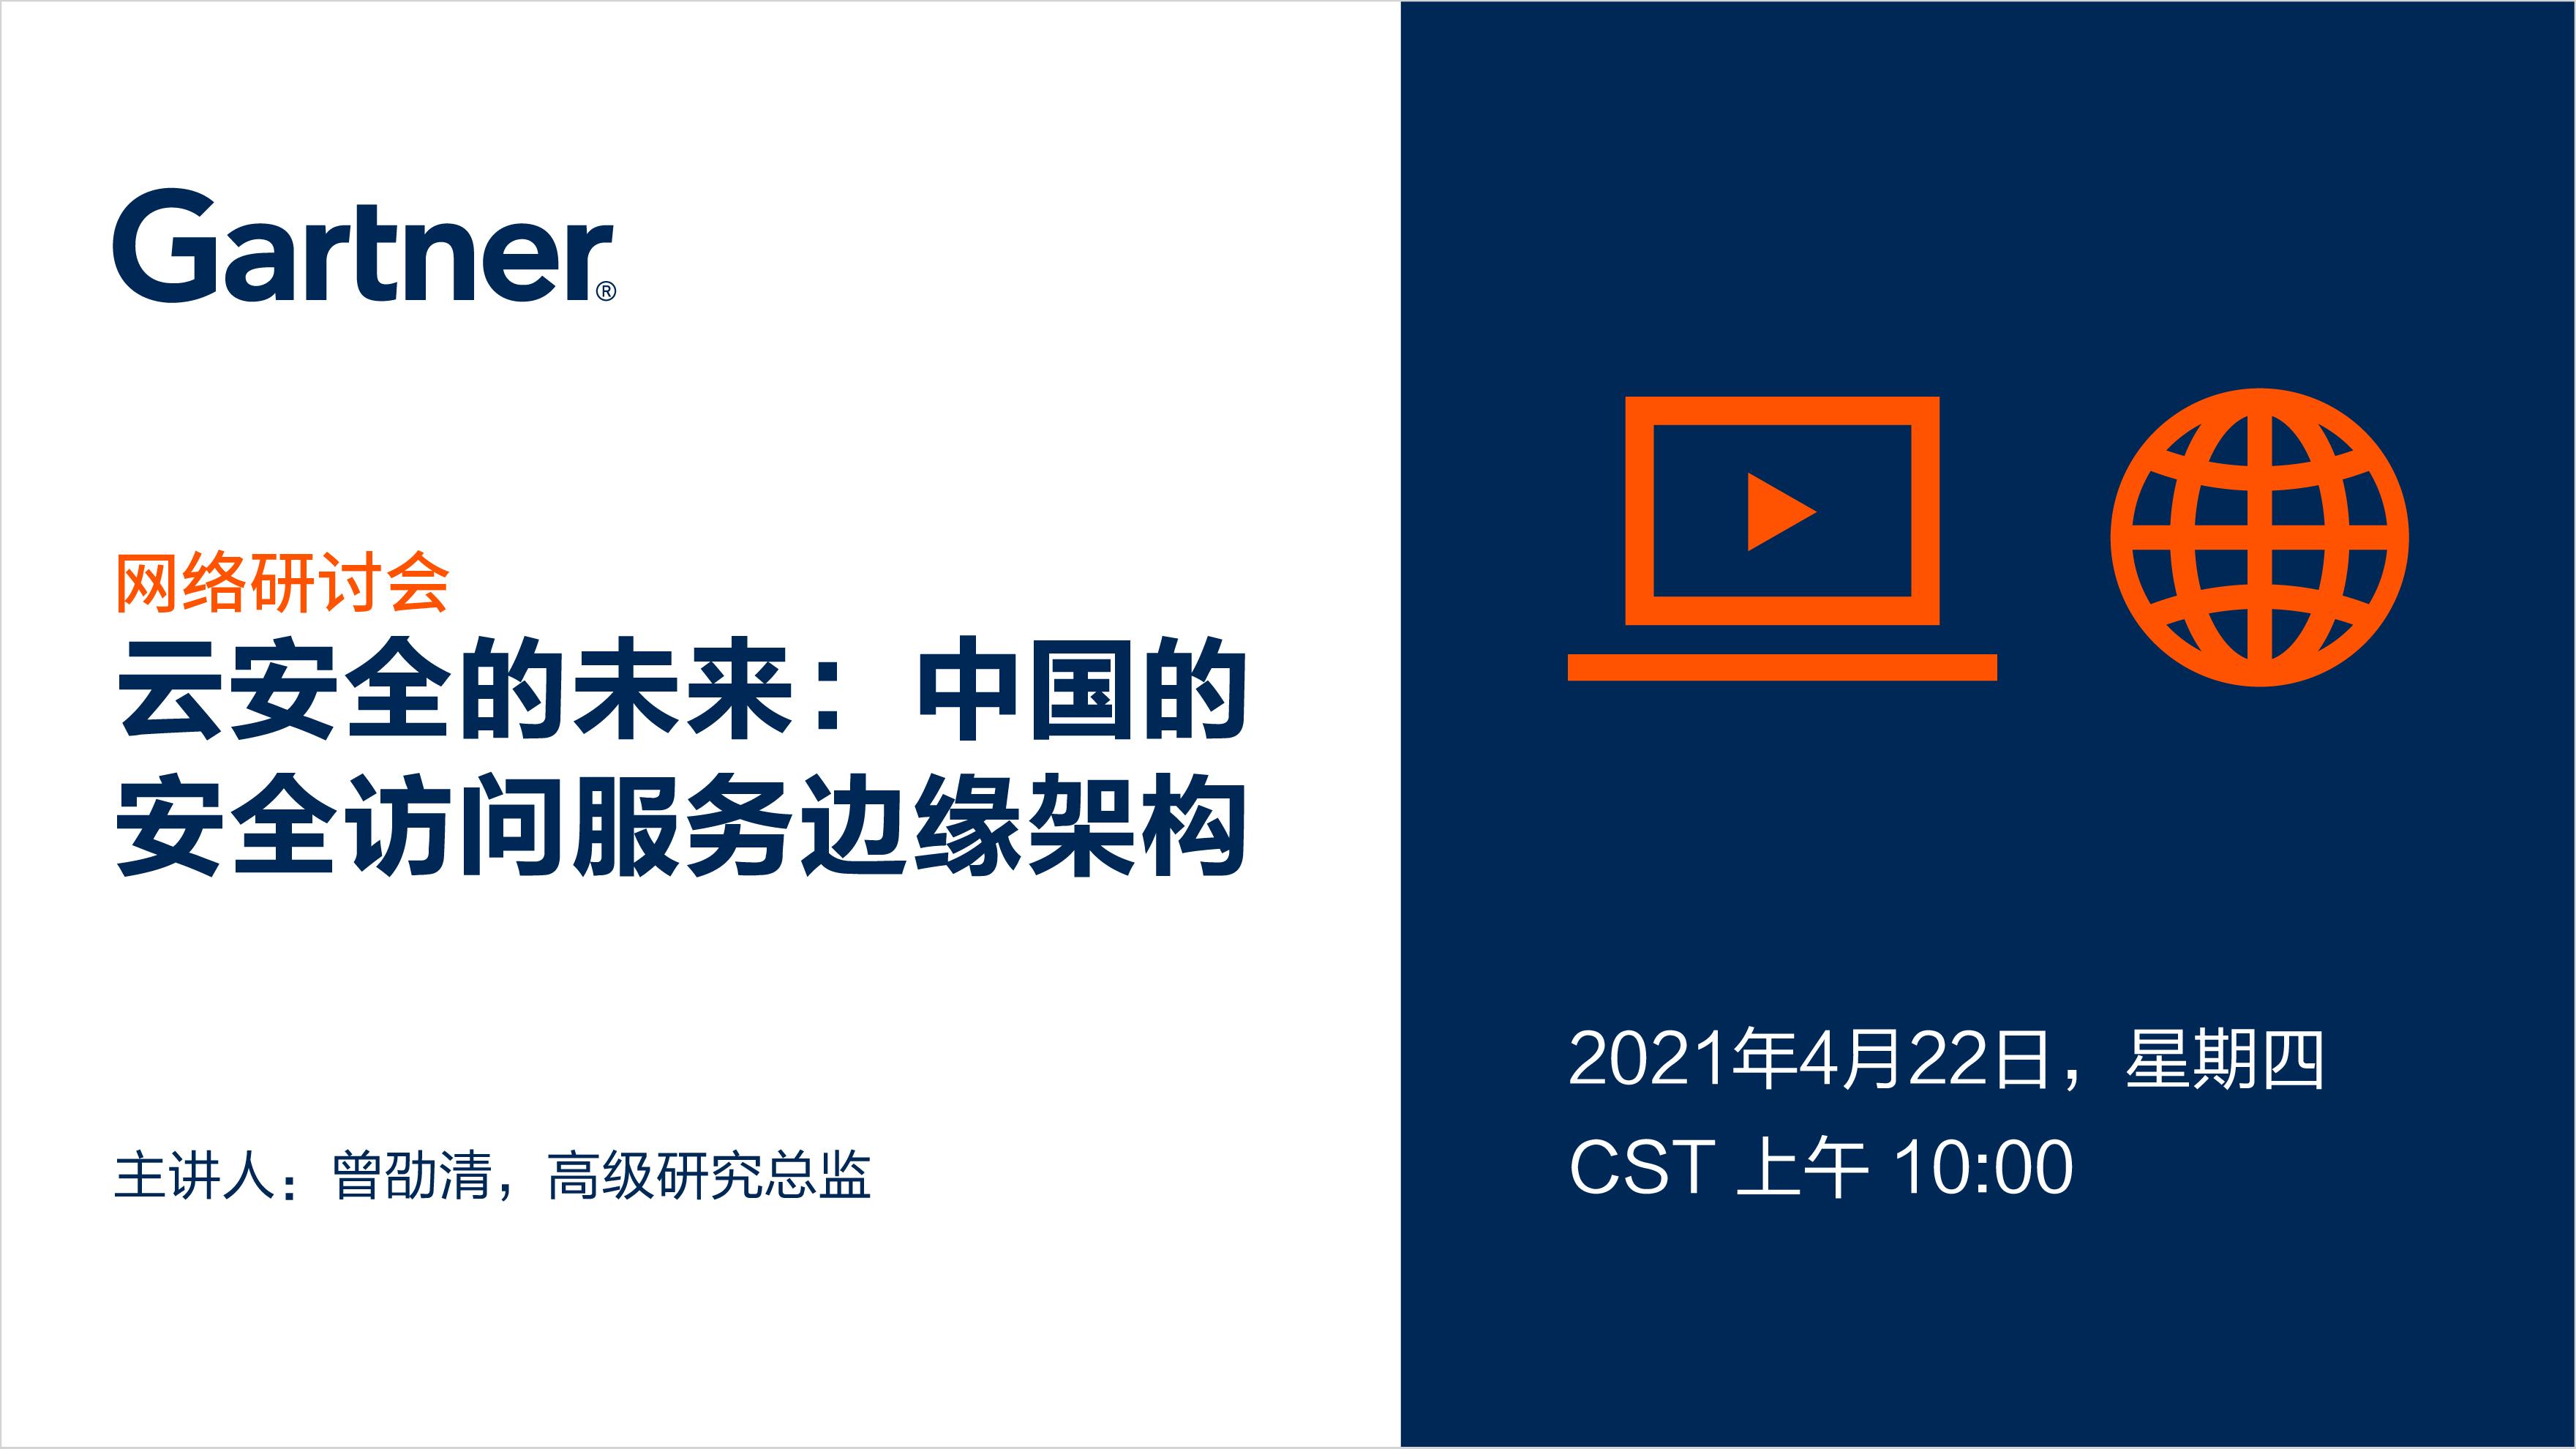 Gartner免费在线研讨会:安全访问服务边缘(SASE)产品策略